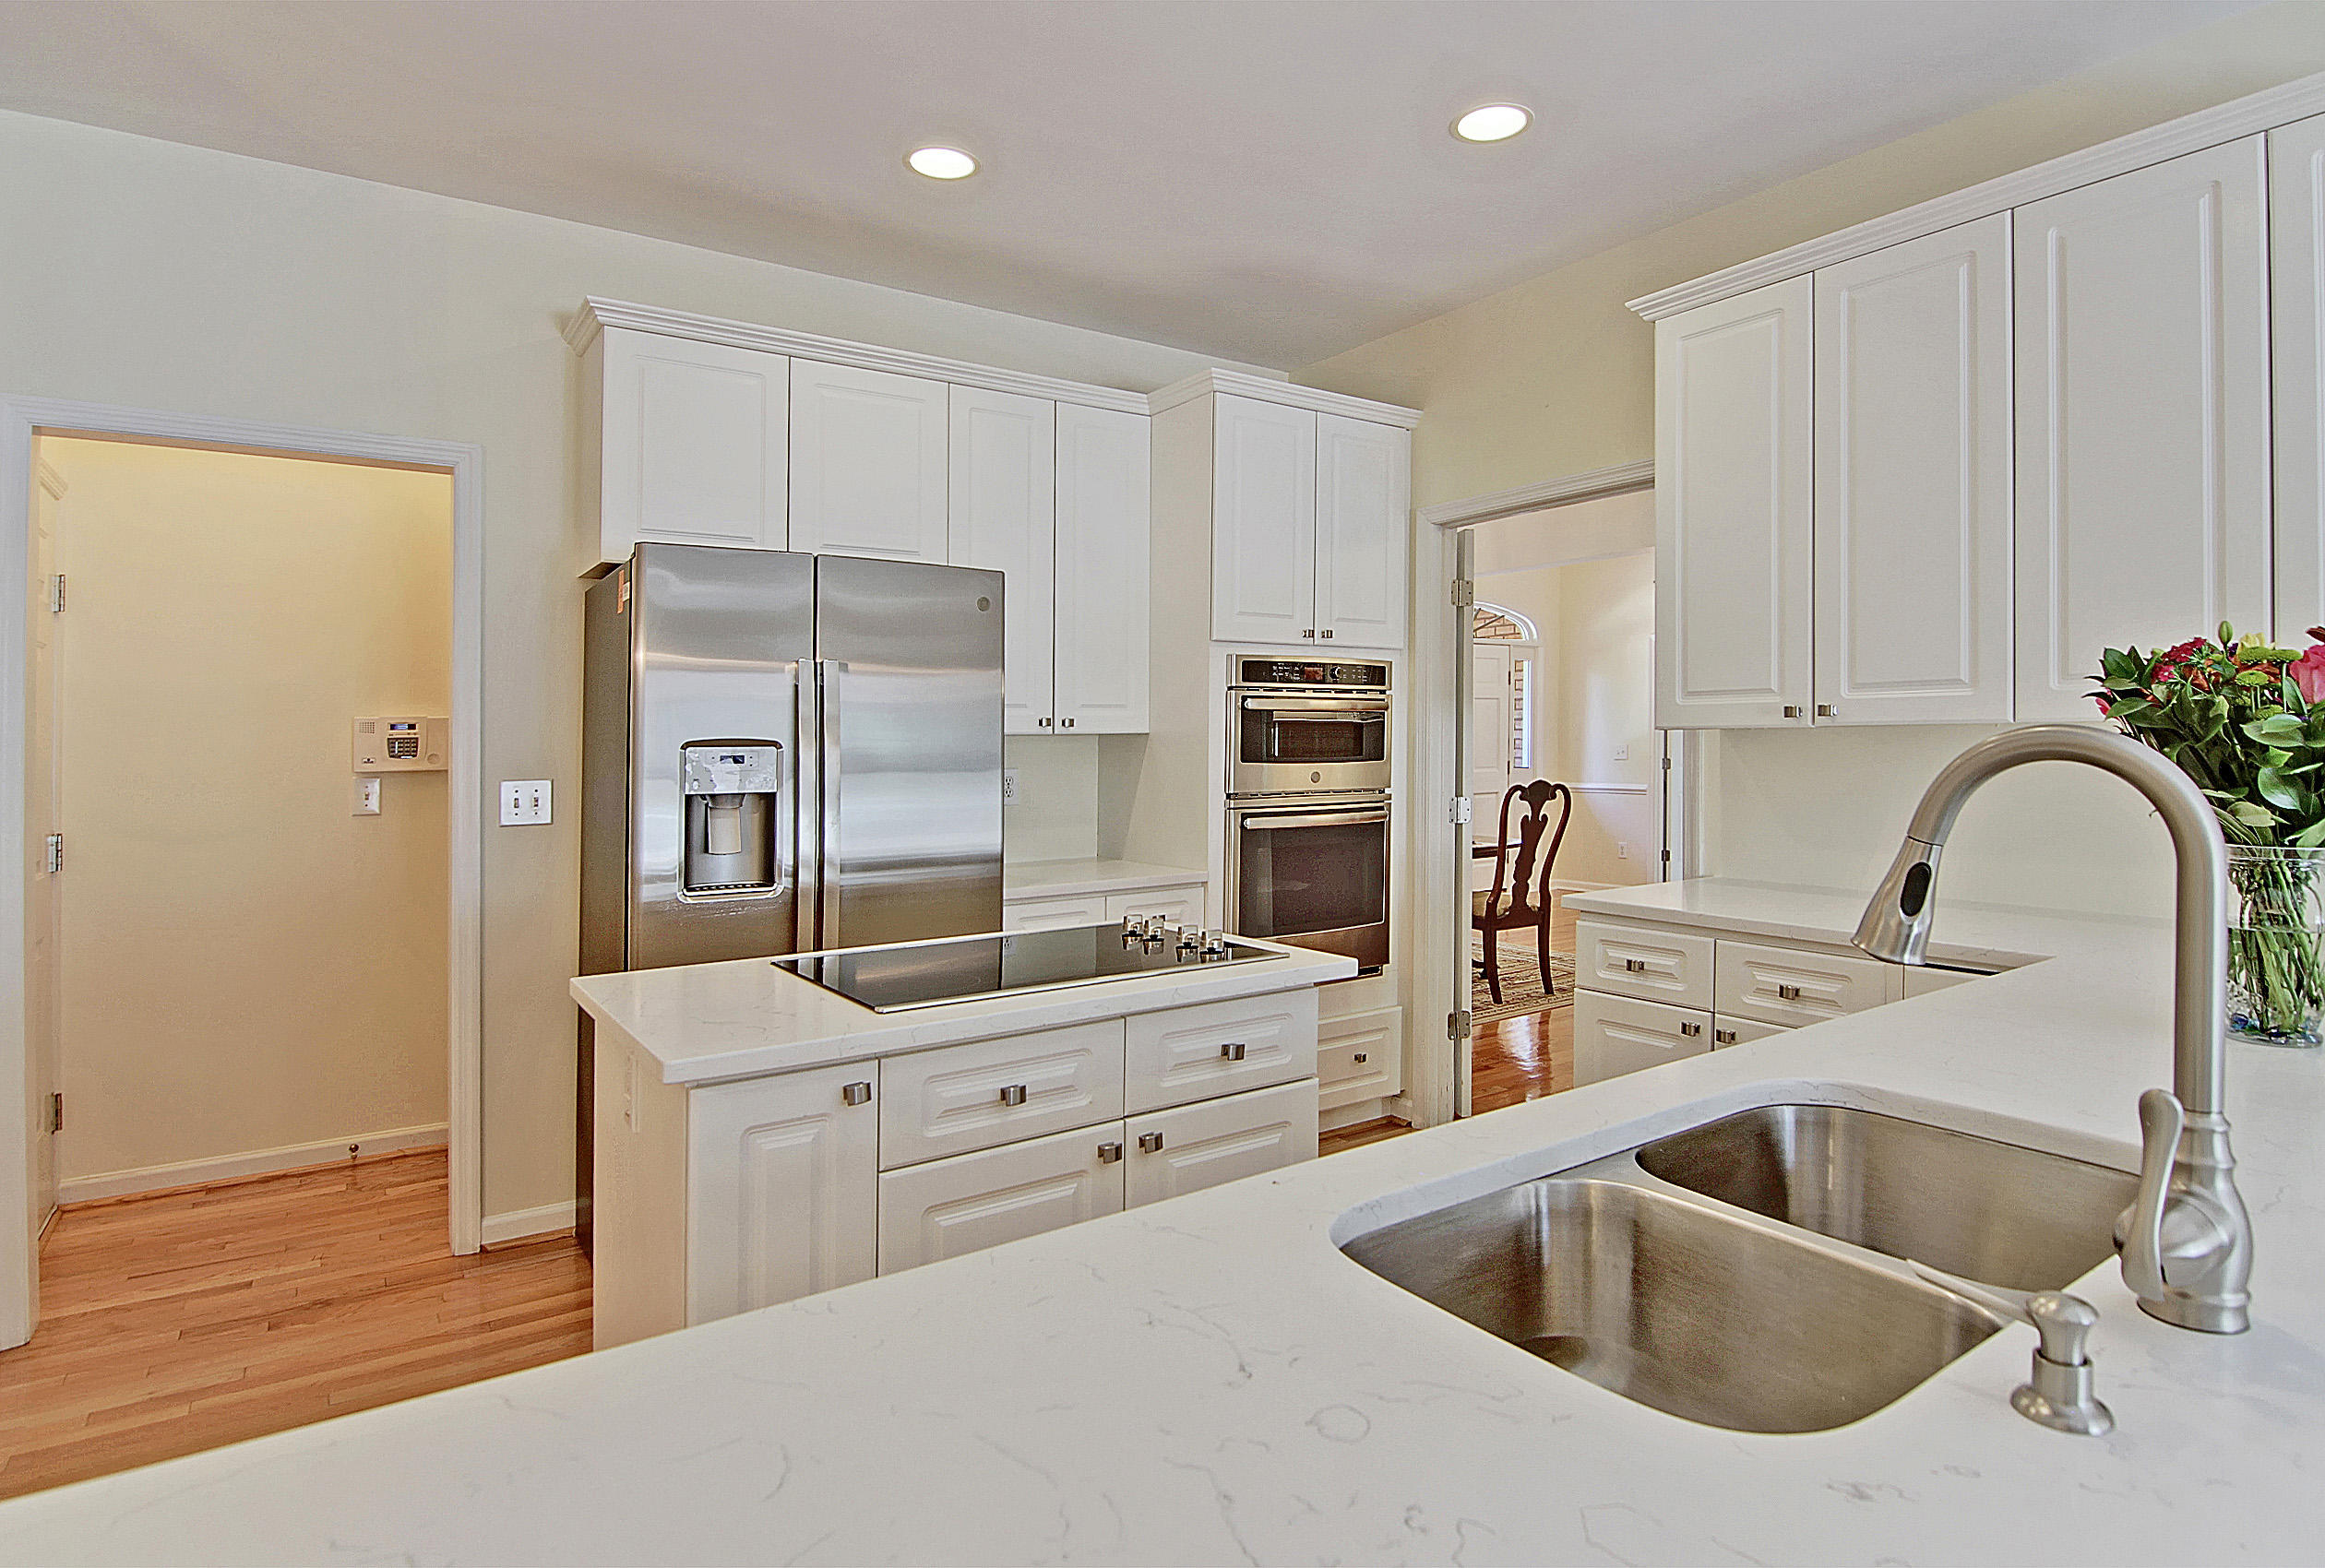 Snee Farm Homes For Sale - 1157 Shilling, Mount Pleasant, SC - 39